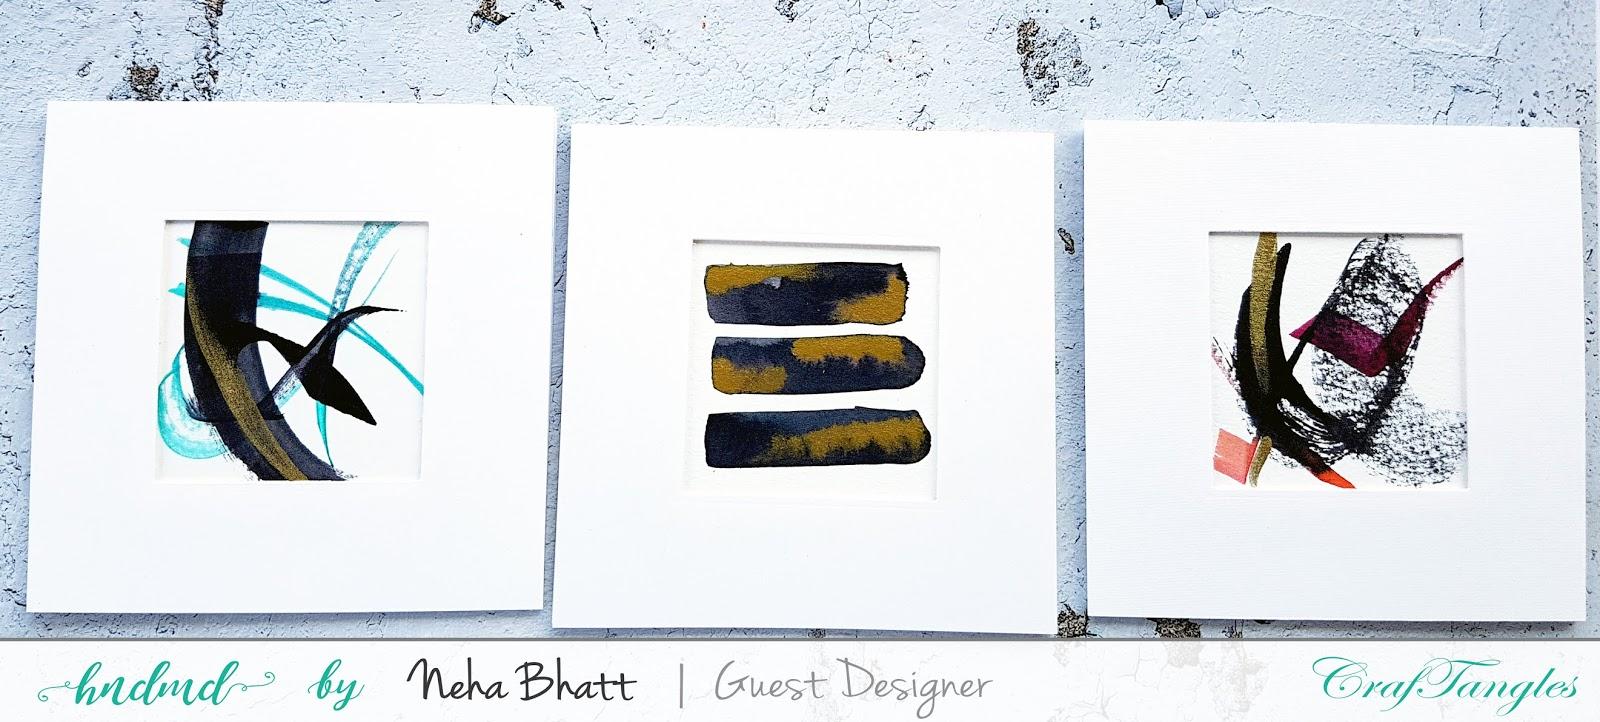 Various ways to use CrafTangles liquid watercolors by Neha Bhatt 8